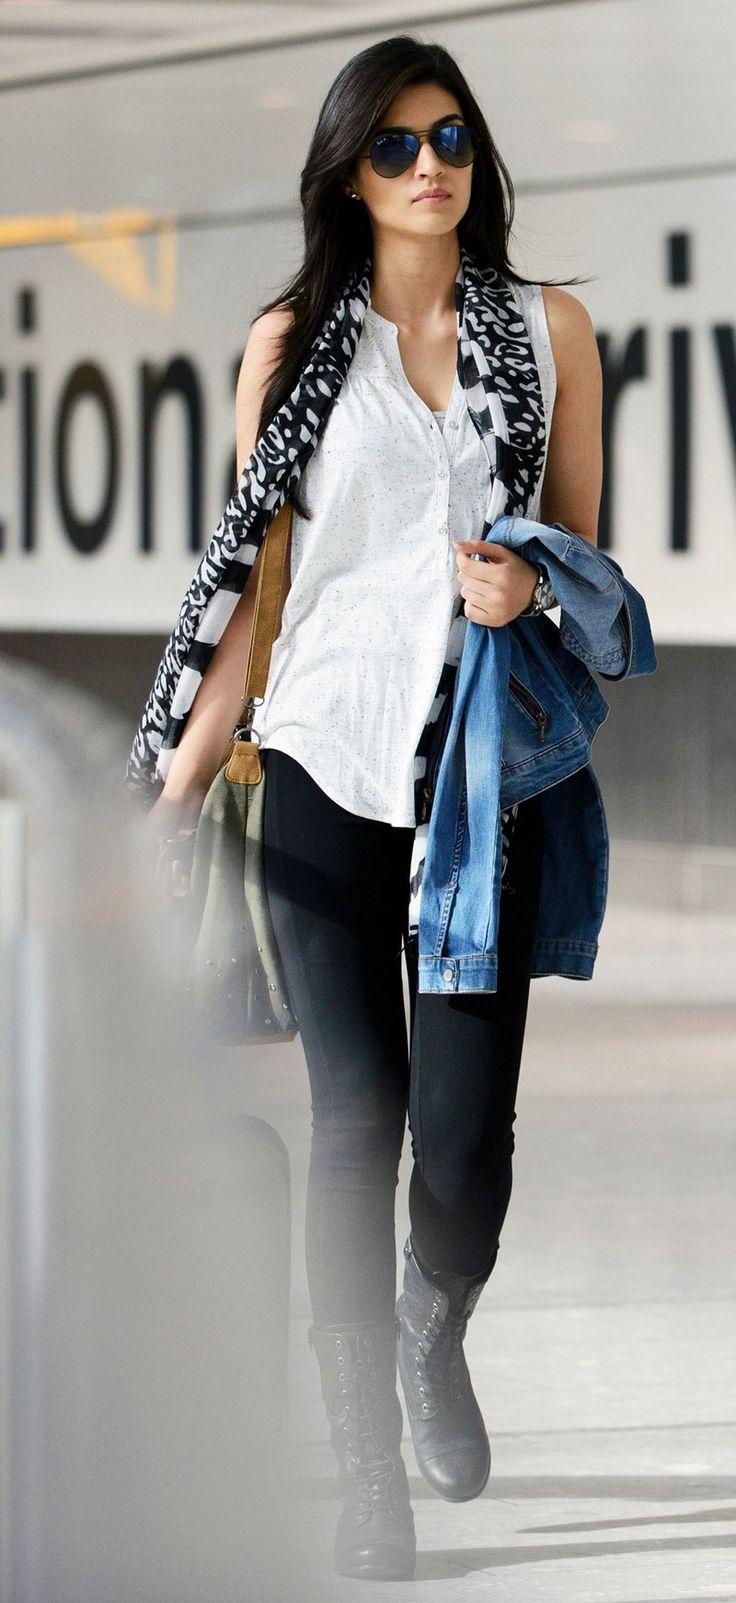 Kriti Sanon #Style #Bollywood #Fashion #Beauty